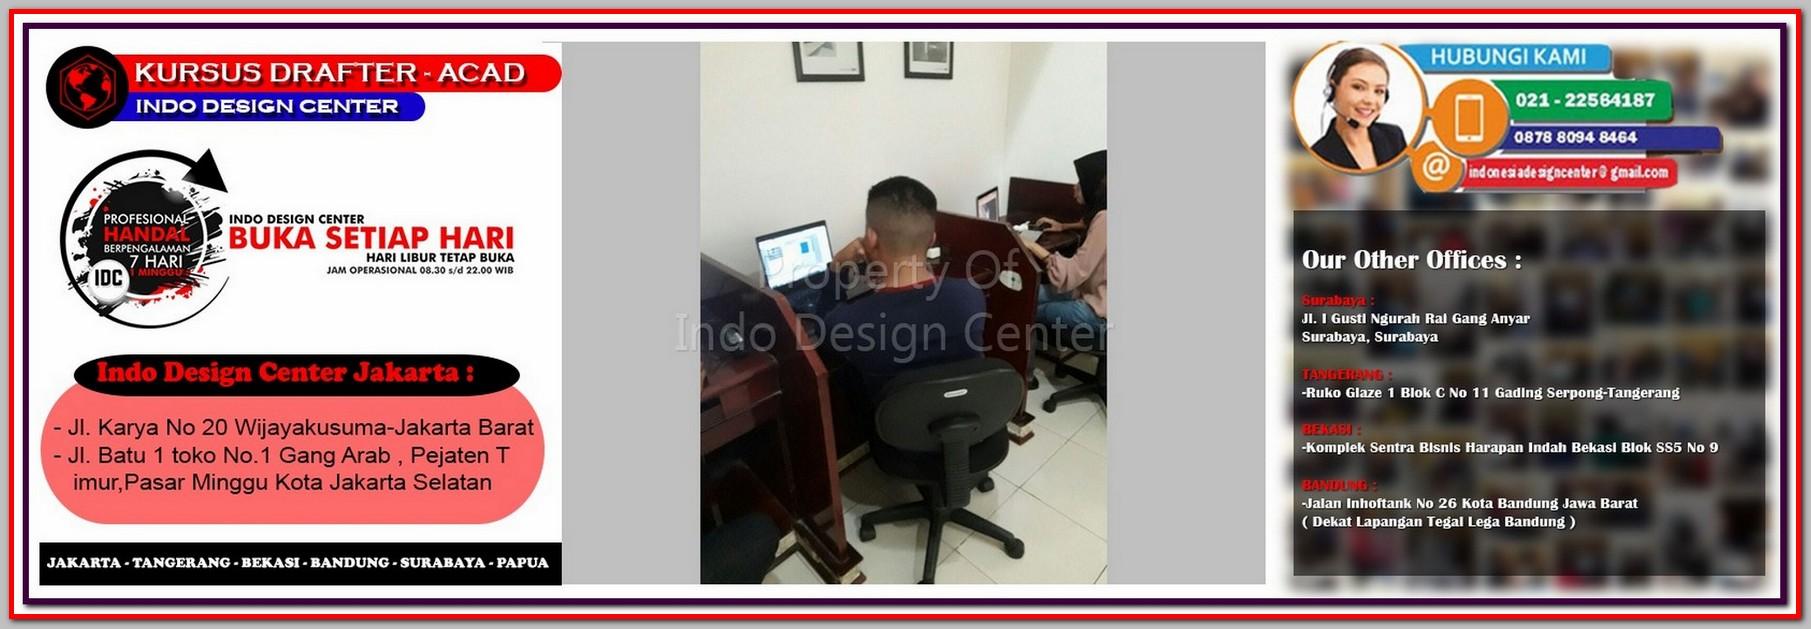 Kursus Arsitek Di Gunung Sahari Selatan - Jakarta - Tangerang - Bekasi - Bandung - Surabaya